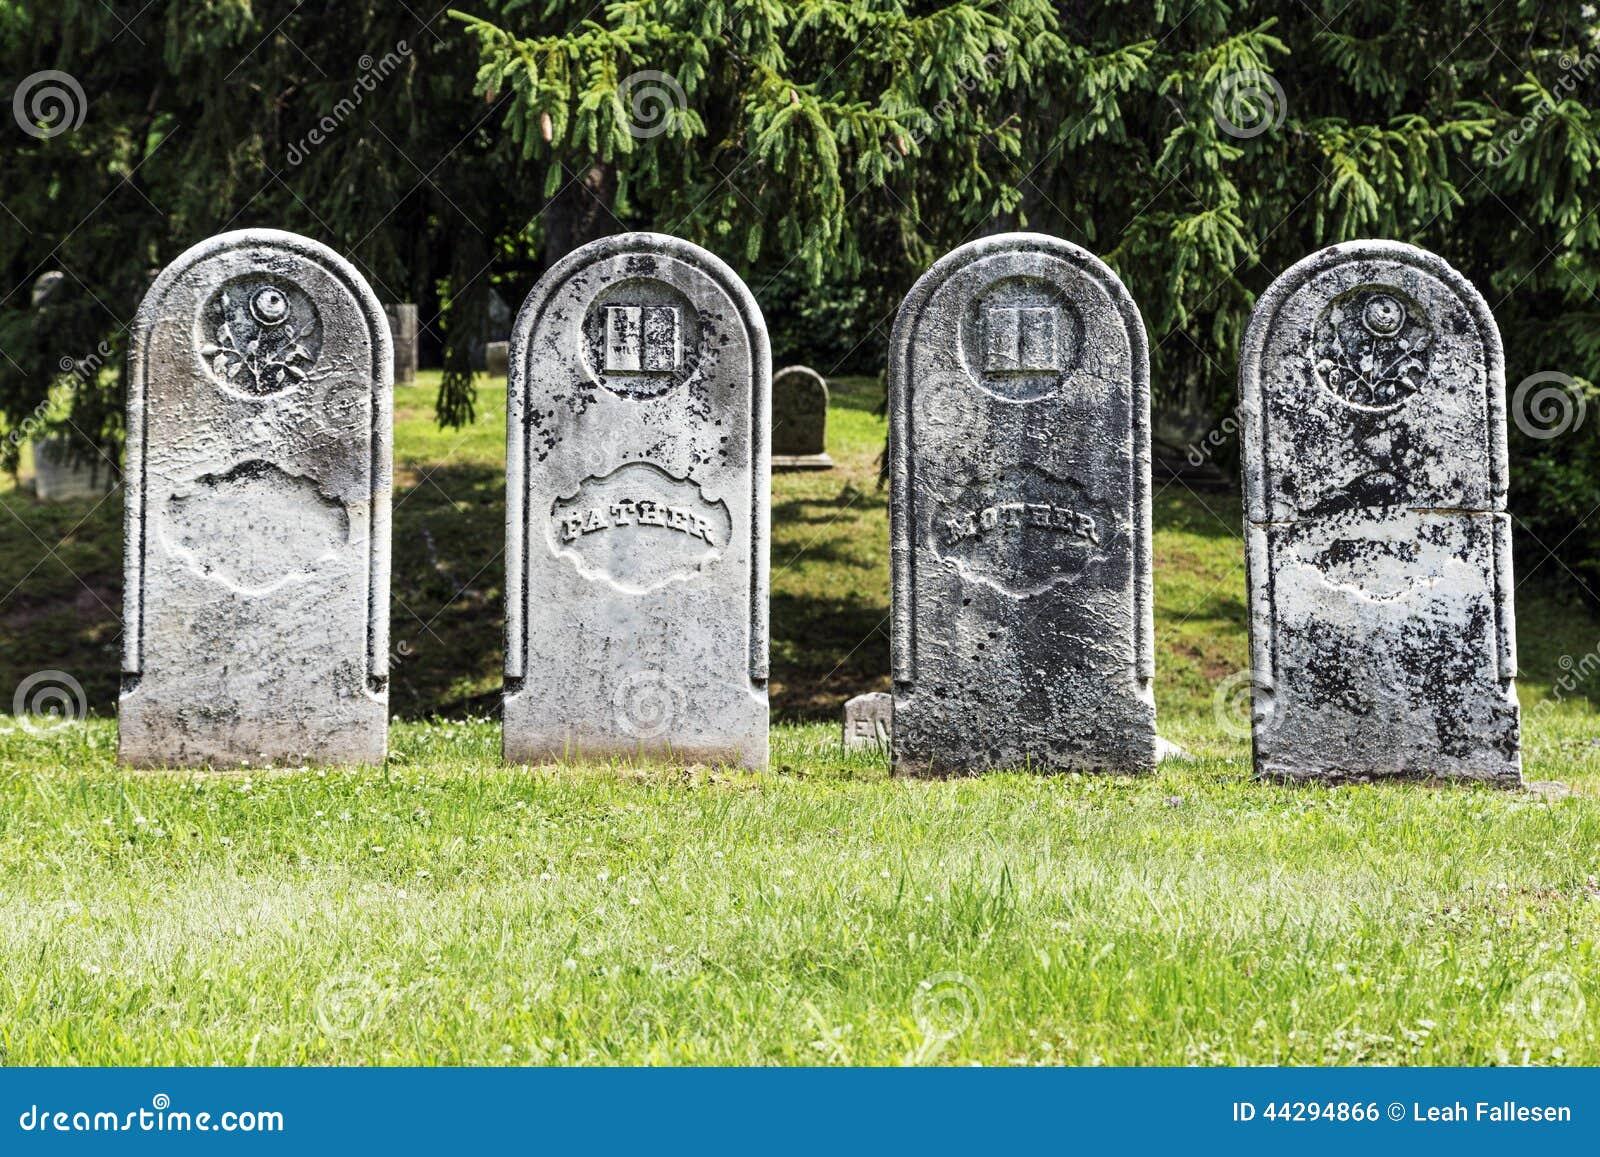 Doom Patrol Doomed [Beast Boy] Four-antique-gravestones-weathered-historic-headstones-row-classic-gravestone-shape-44294866